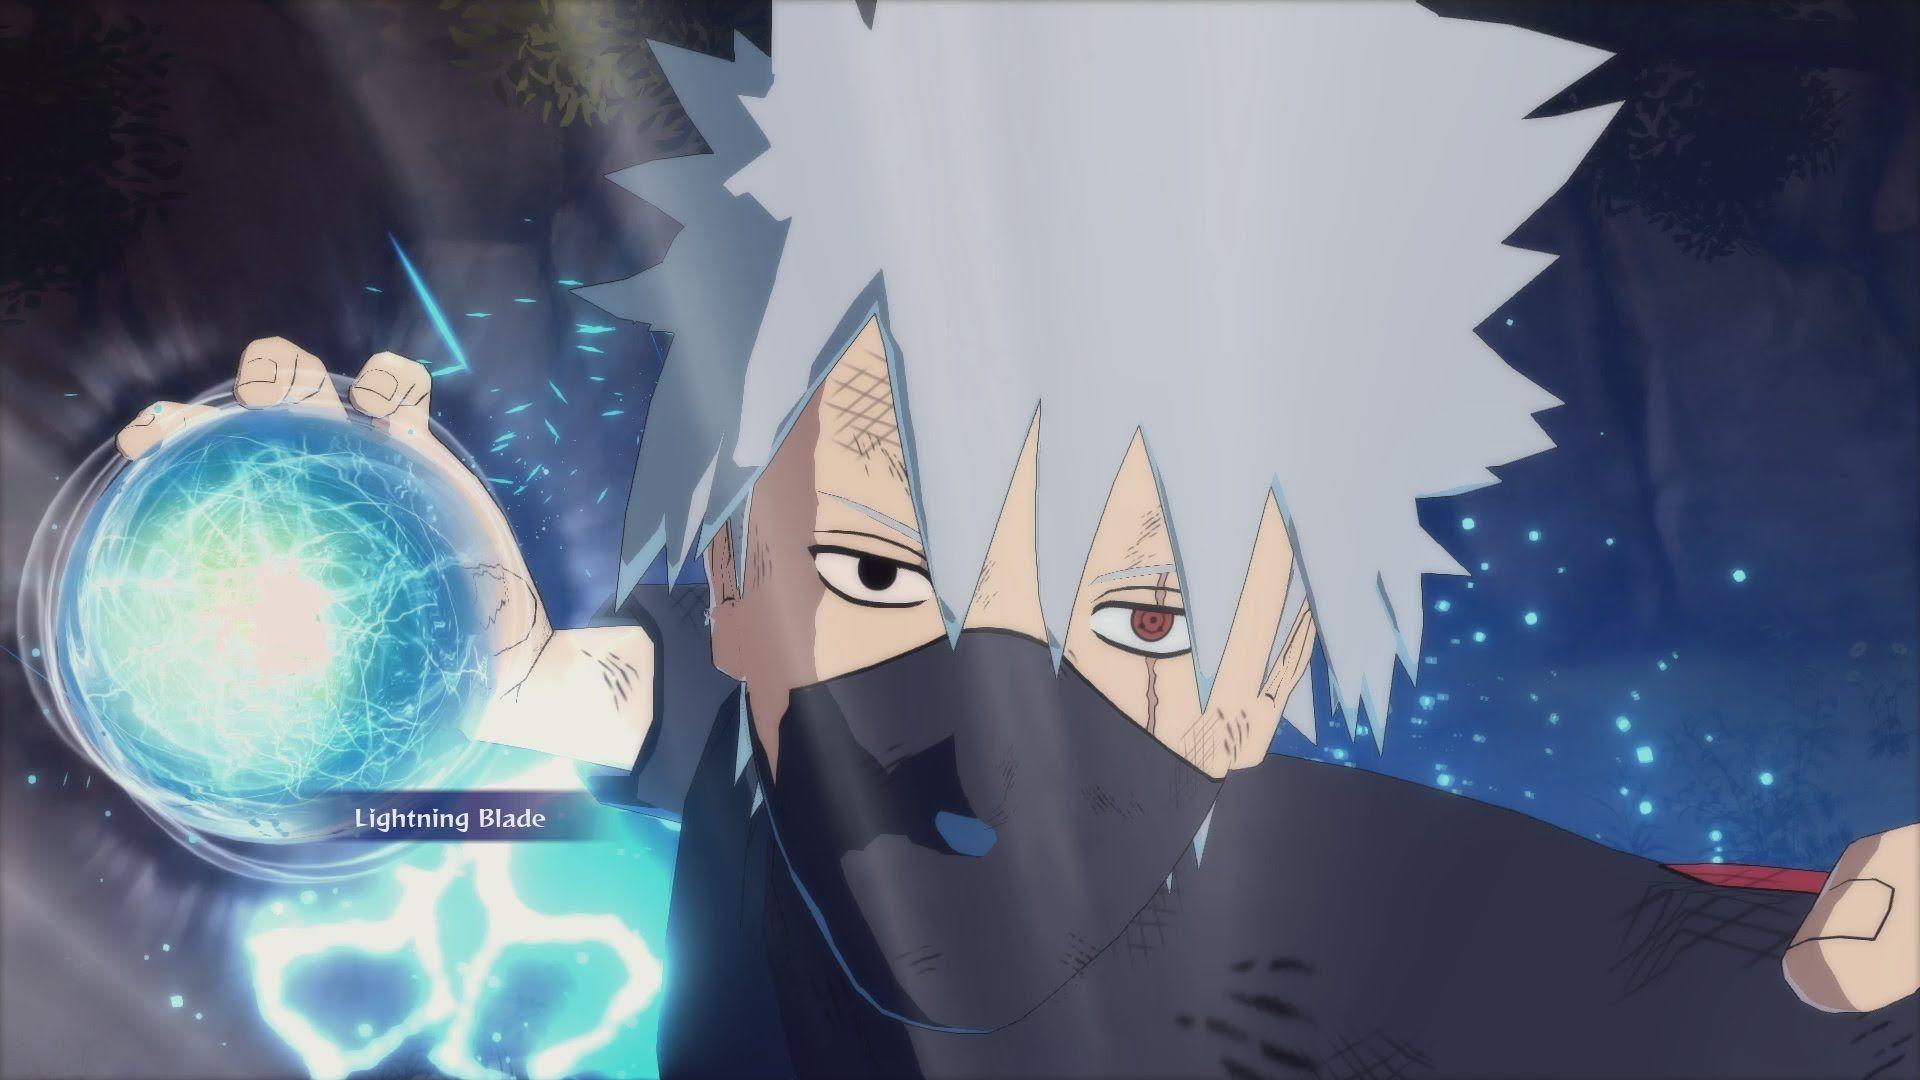 Fantastic Wallpaper Naruto Supreme - 1545f80ae310fad9a0b1387efa339f74  Perfect Image Reference.jpg